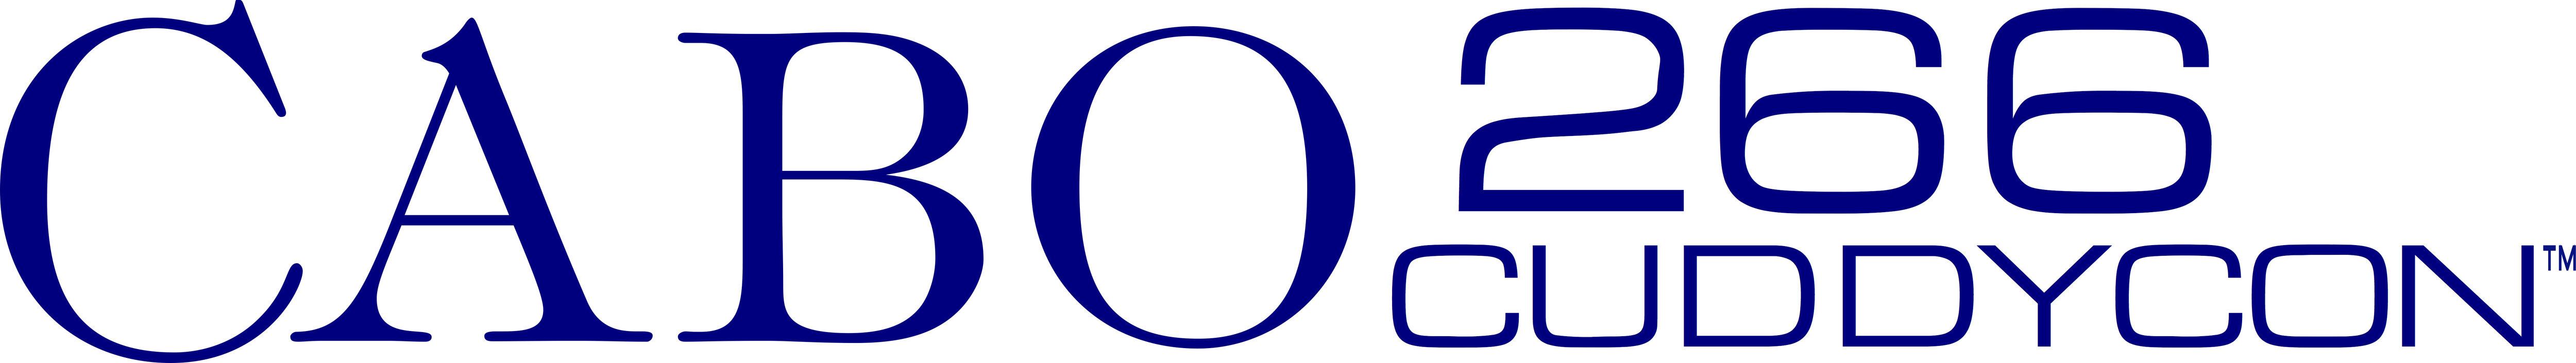 CABO 266 Decal .jpg